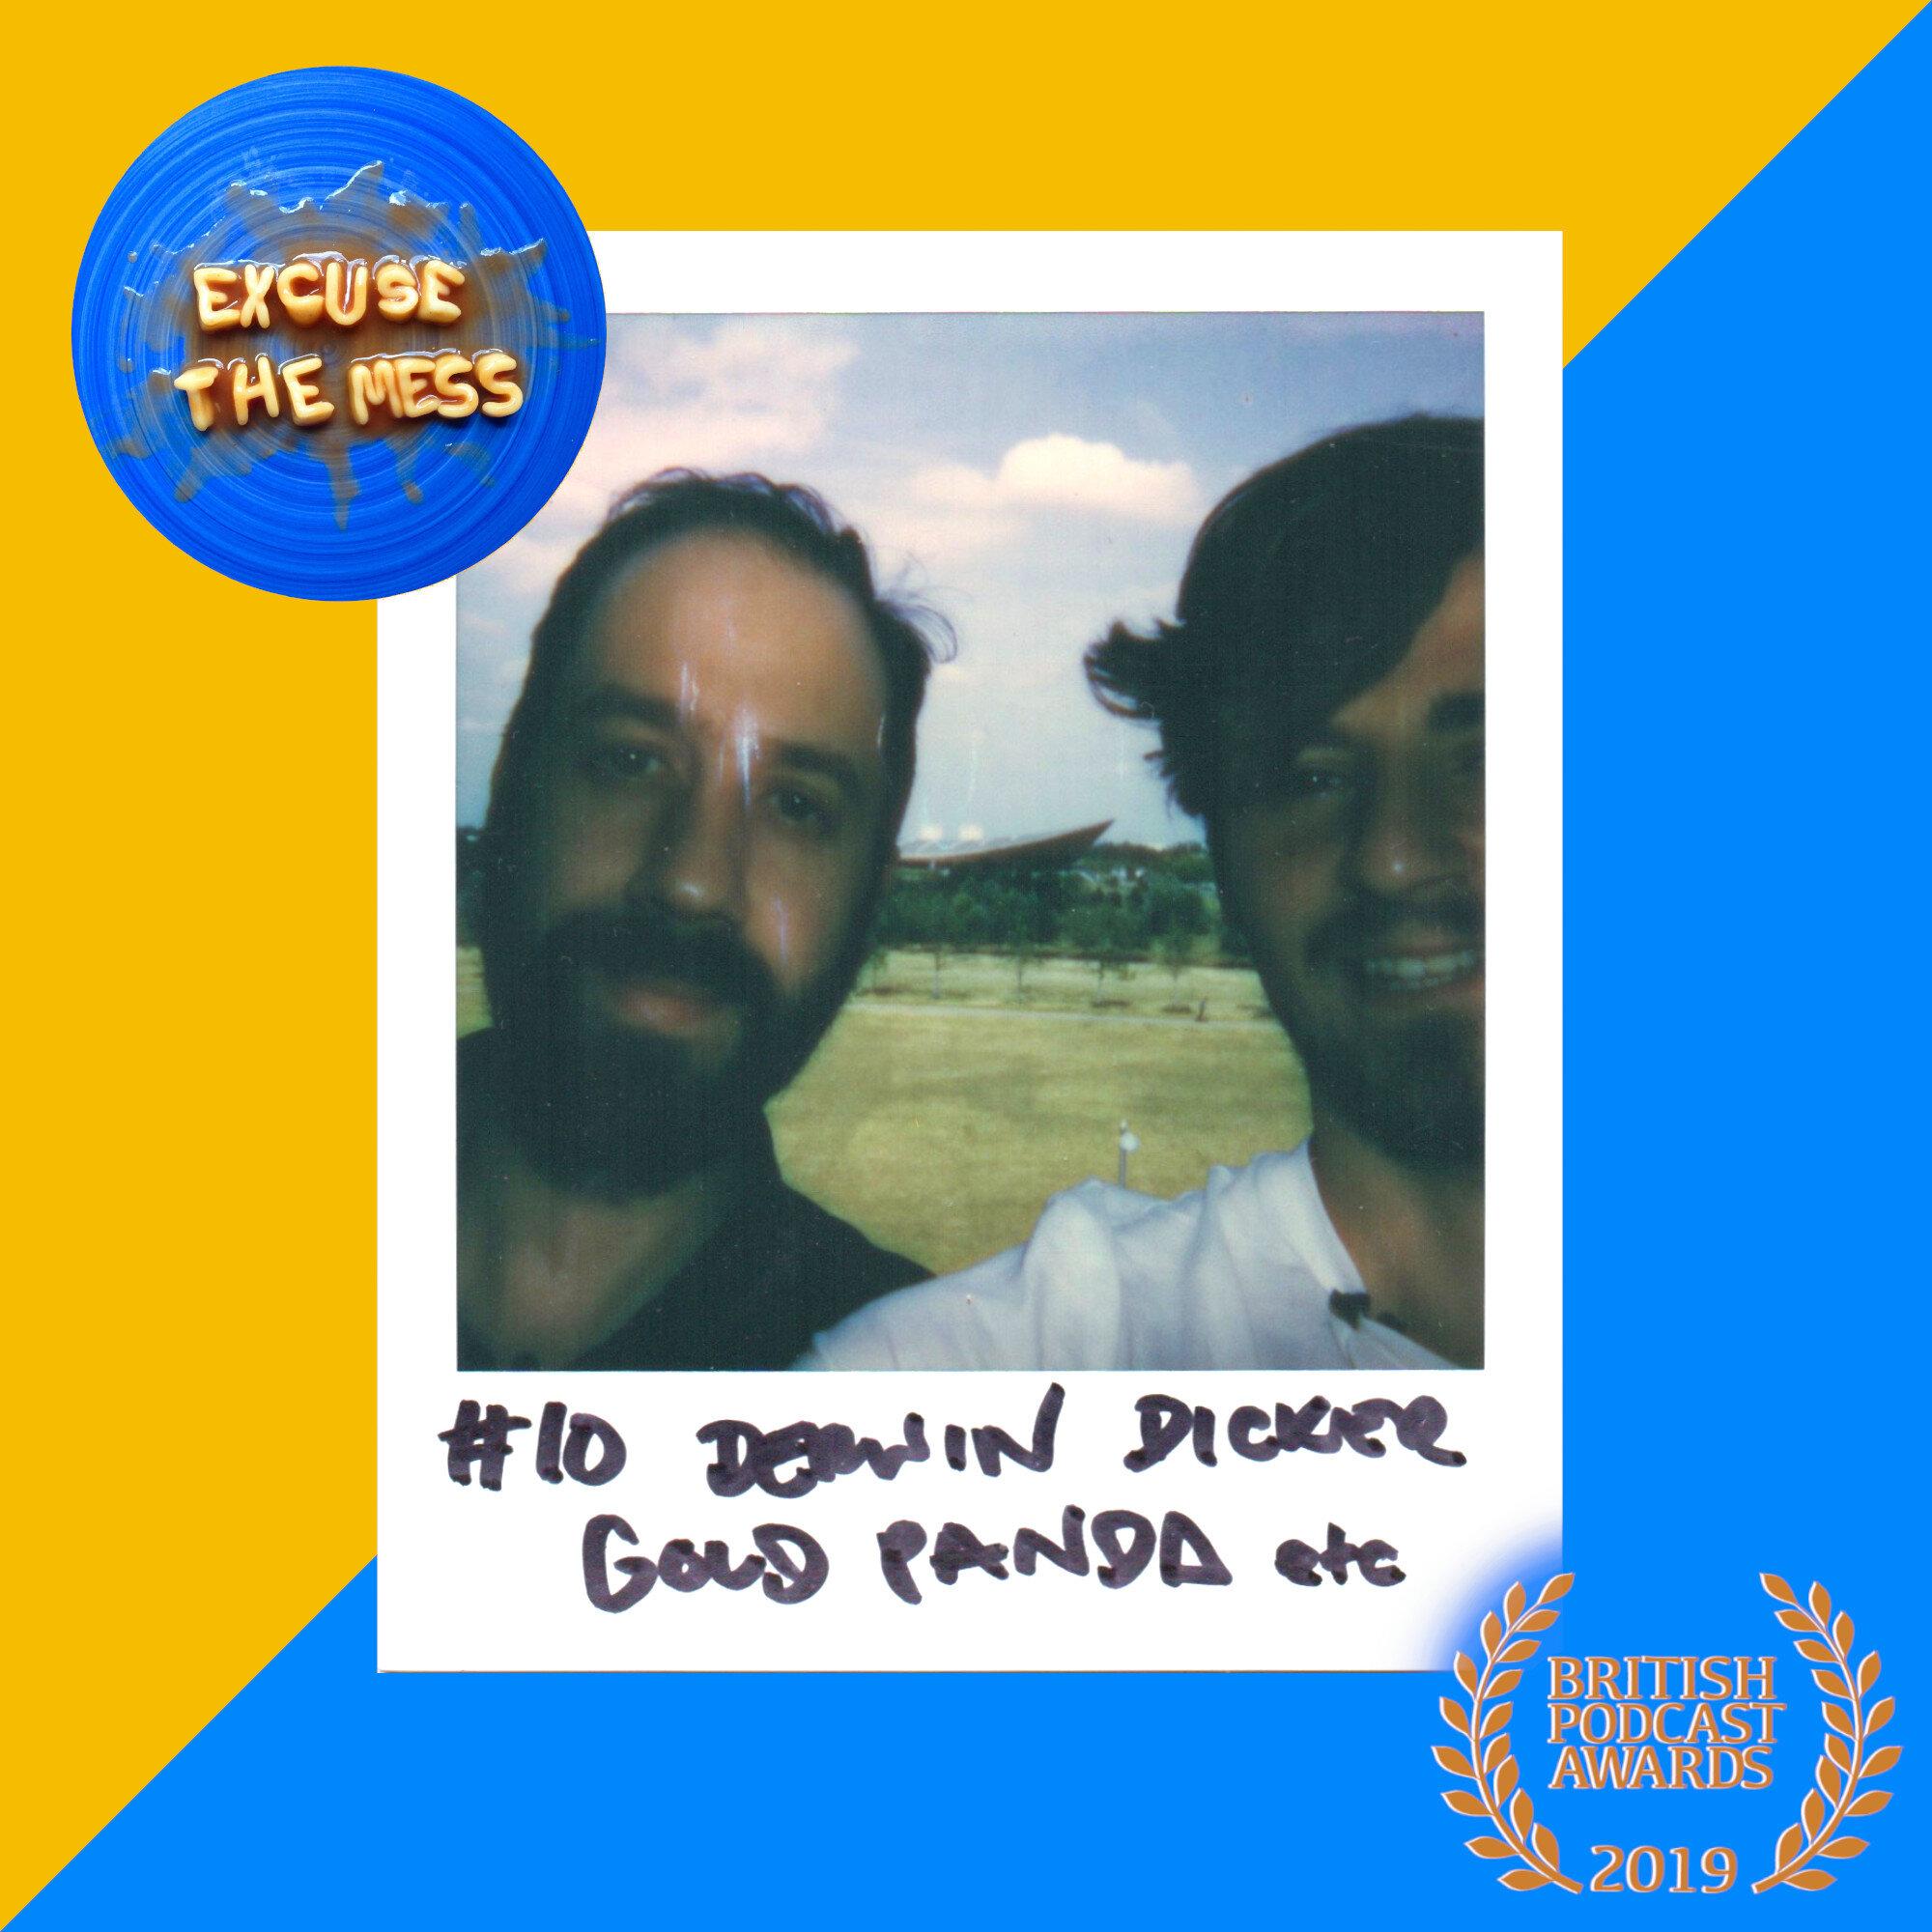 Episode 10 Derwin Dicker ALT 1.jpg